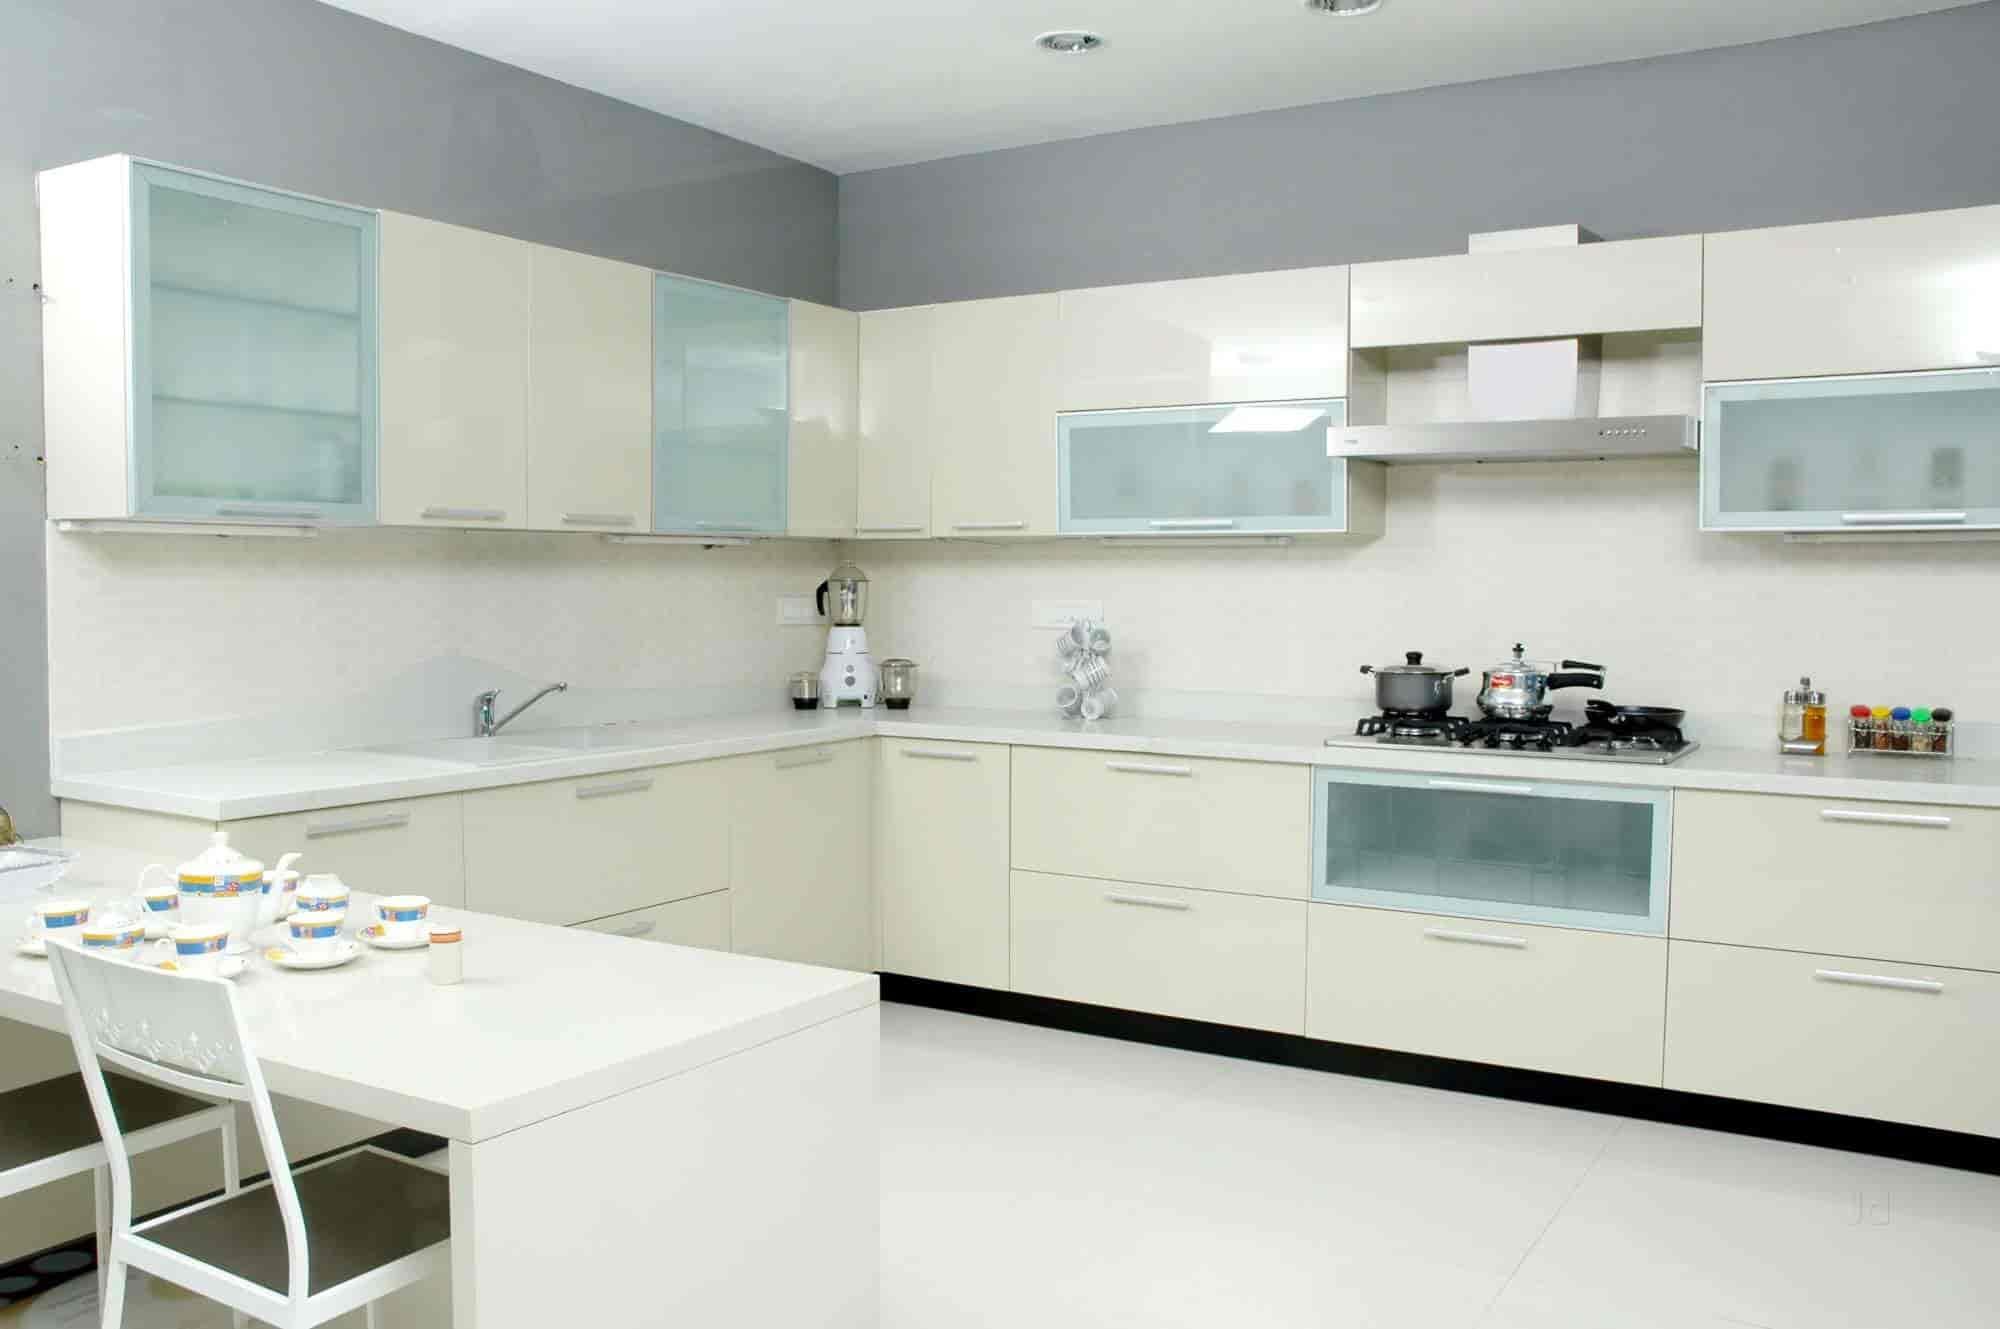 Ambadas Kitchens, Station Road - Modular Kitchen Dealers in Hubli ...